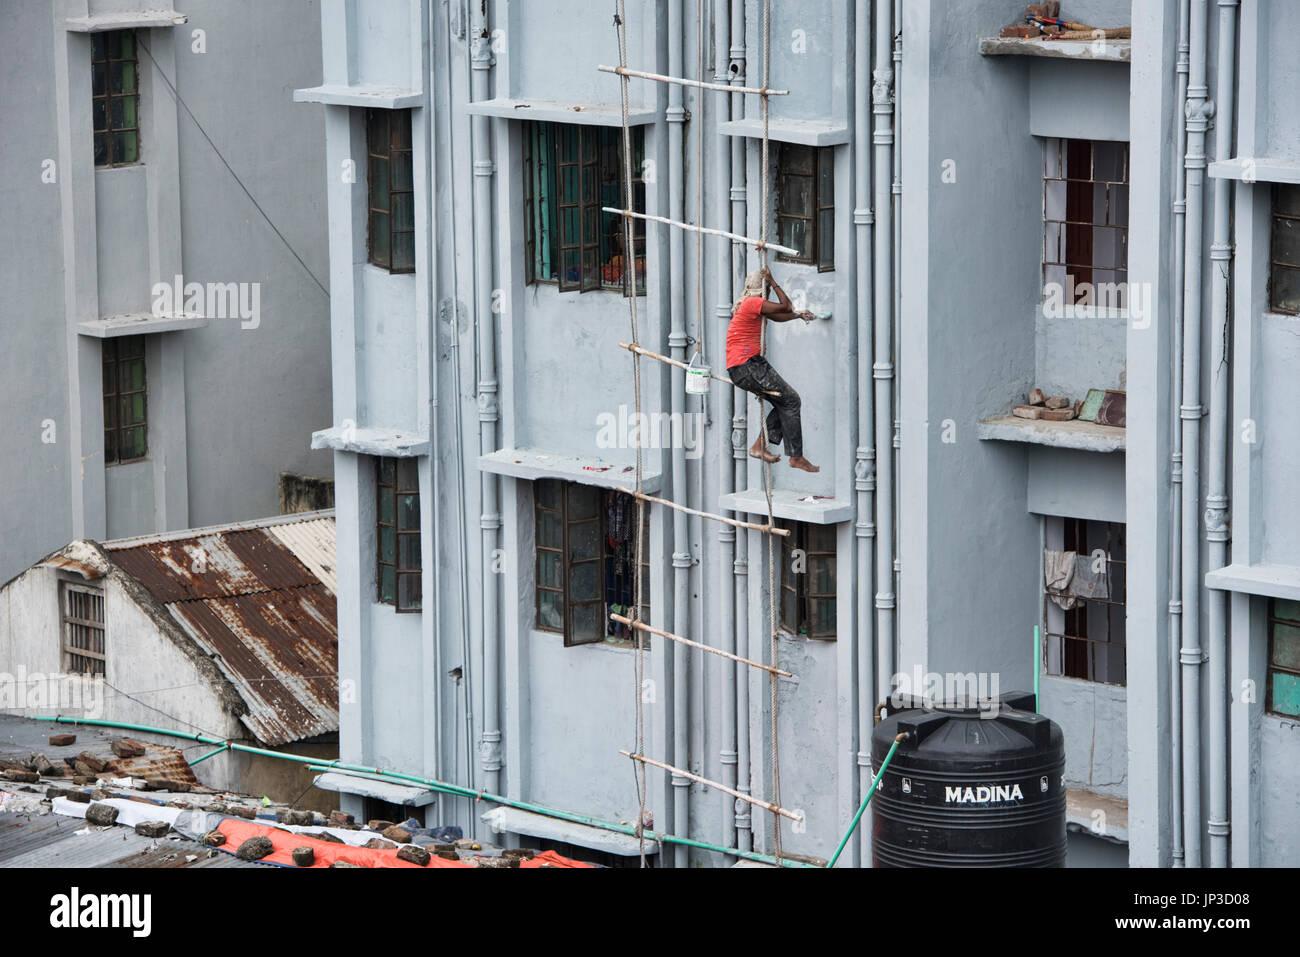 Building maintenance in Old Dhaka, Bangladesh - Stock Image